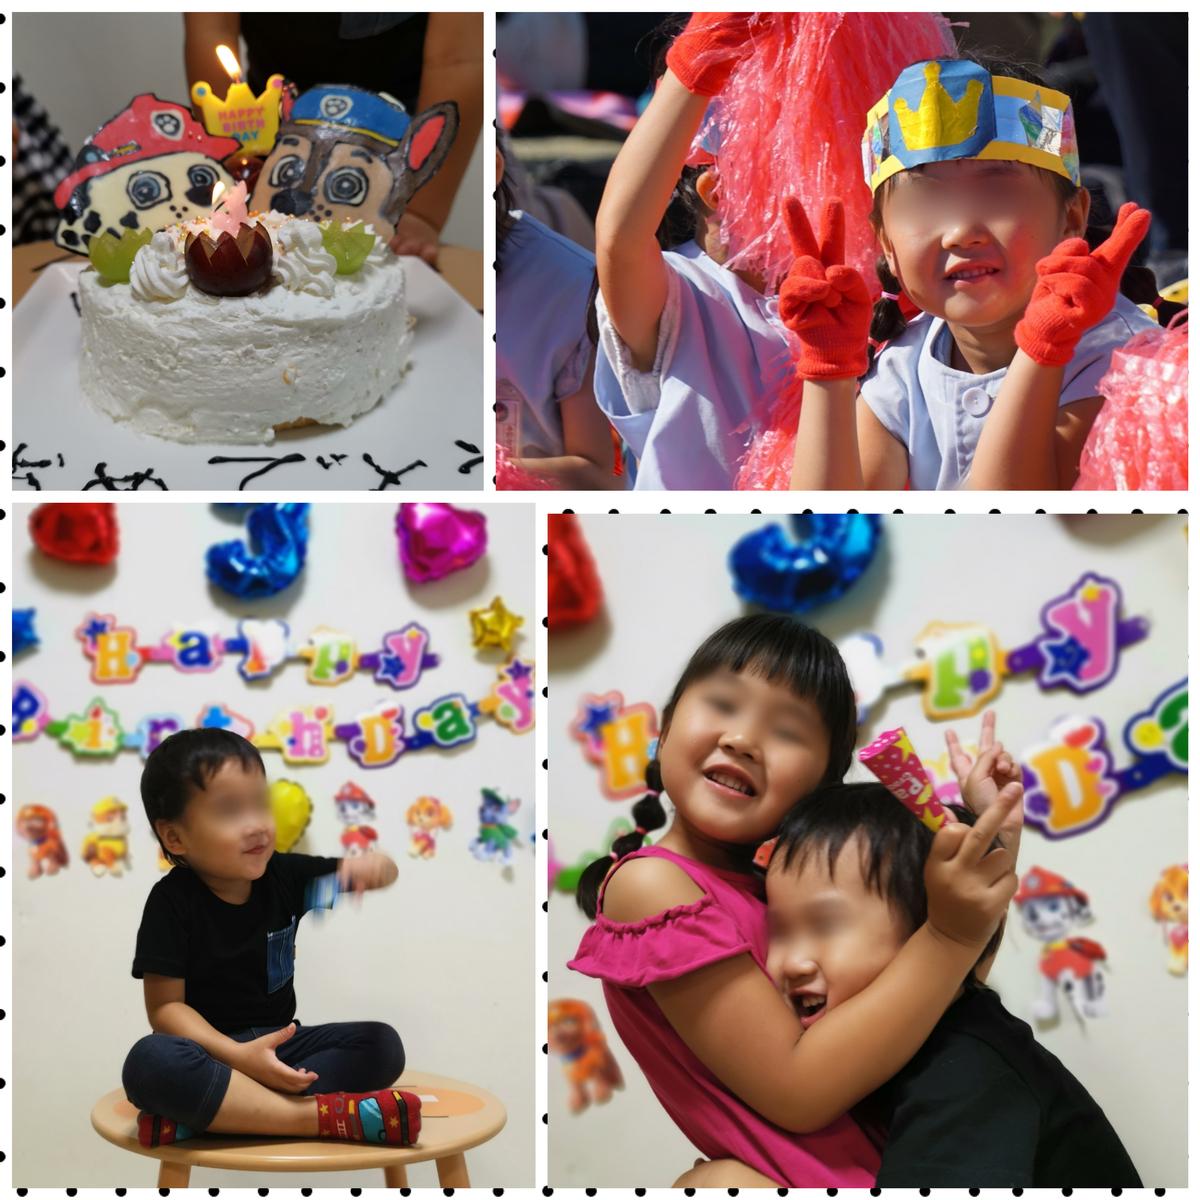 年長運動会と3歳誕生日